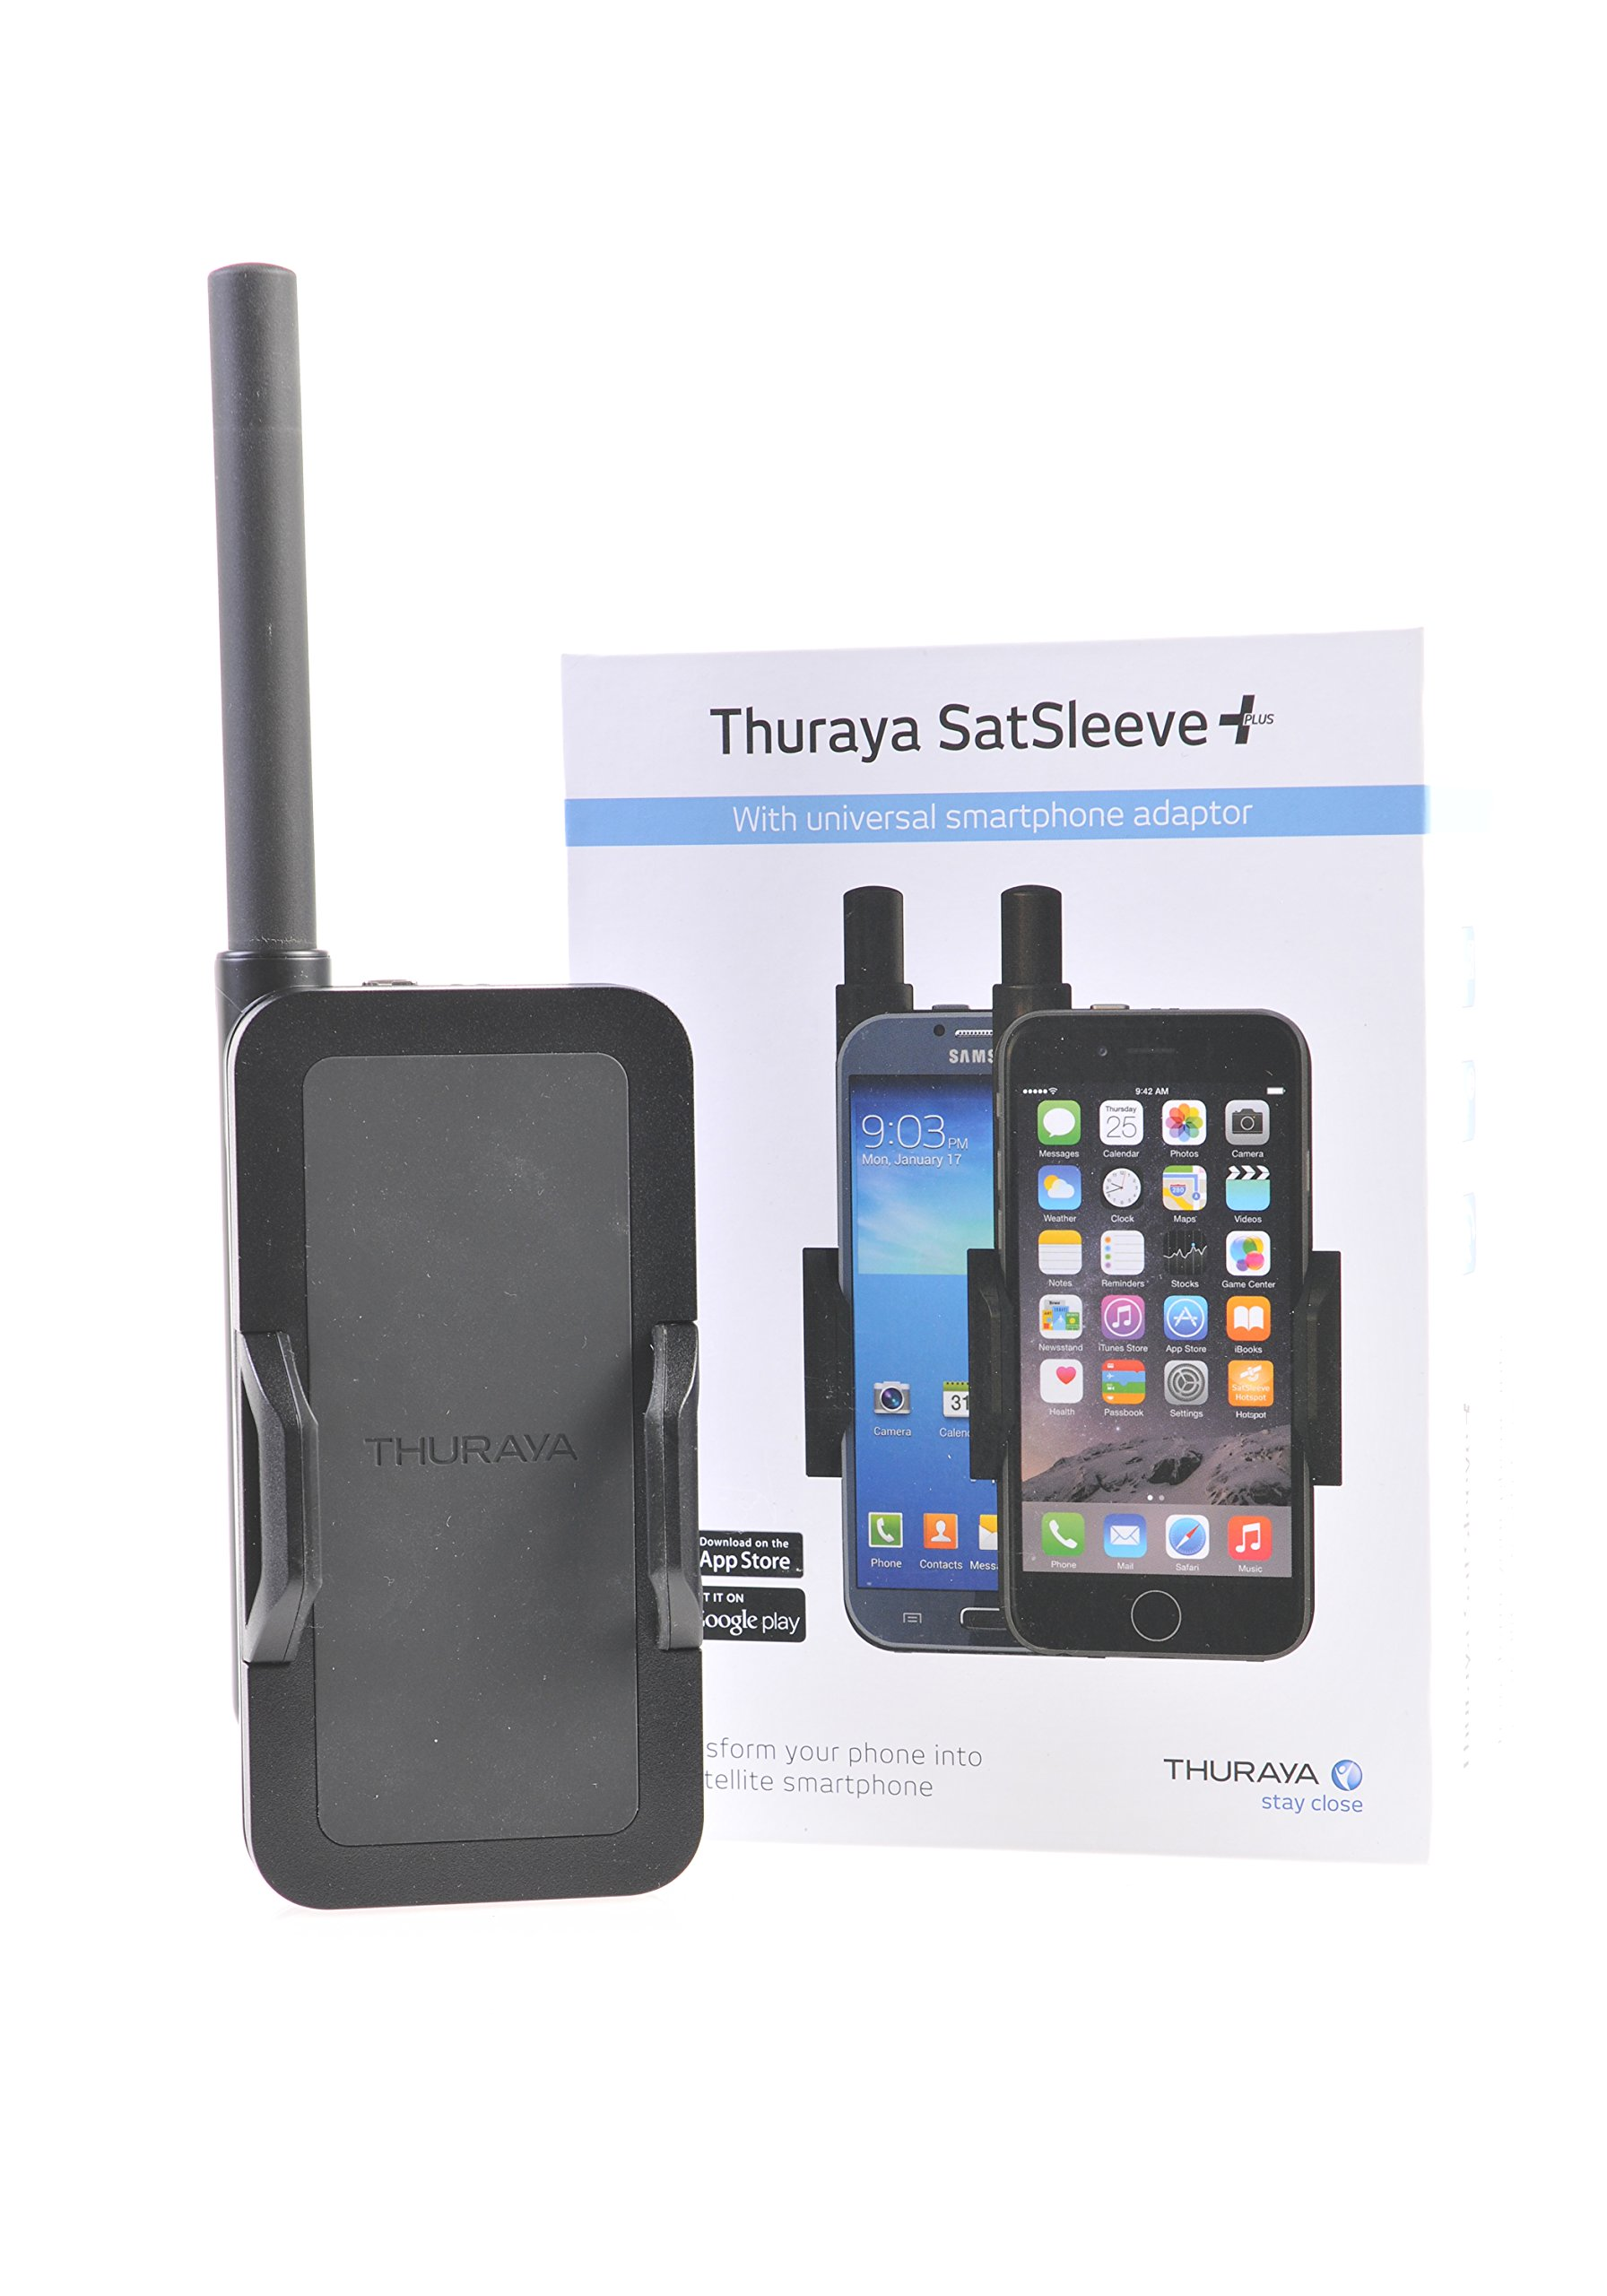 Thuraya satellite Satsleeve + (Plus) for Smartphones iPhone Android